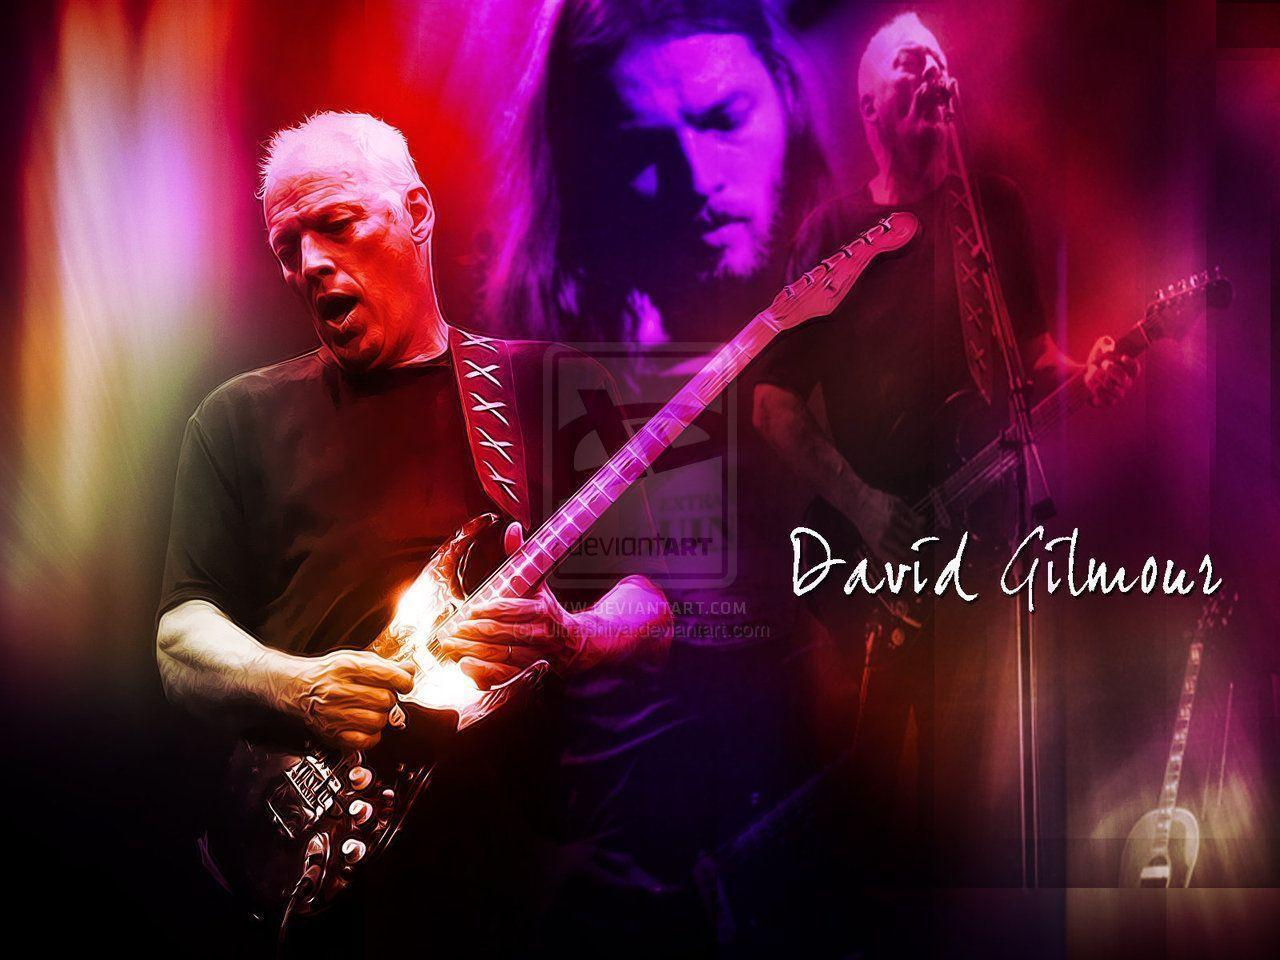 Pink Floyd Animals Wallpaper David Gilmour Wallpapers Wallpaper Cave